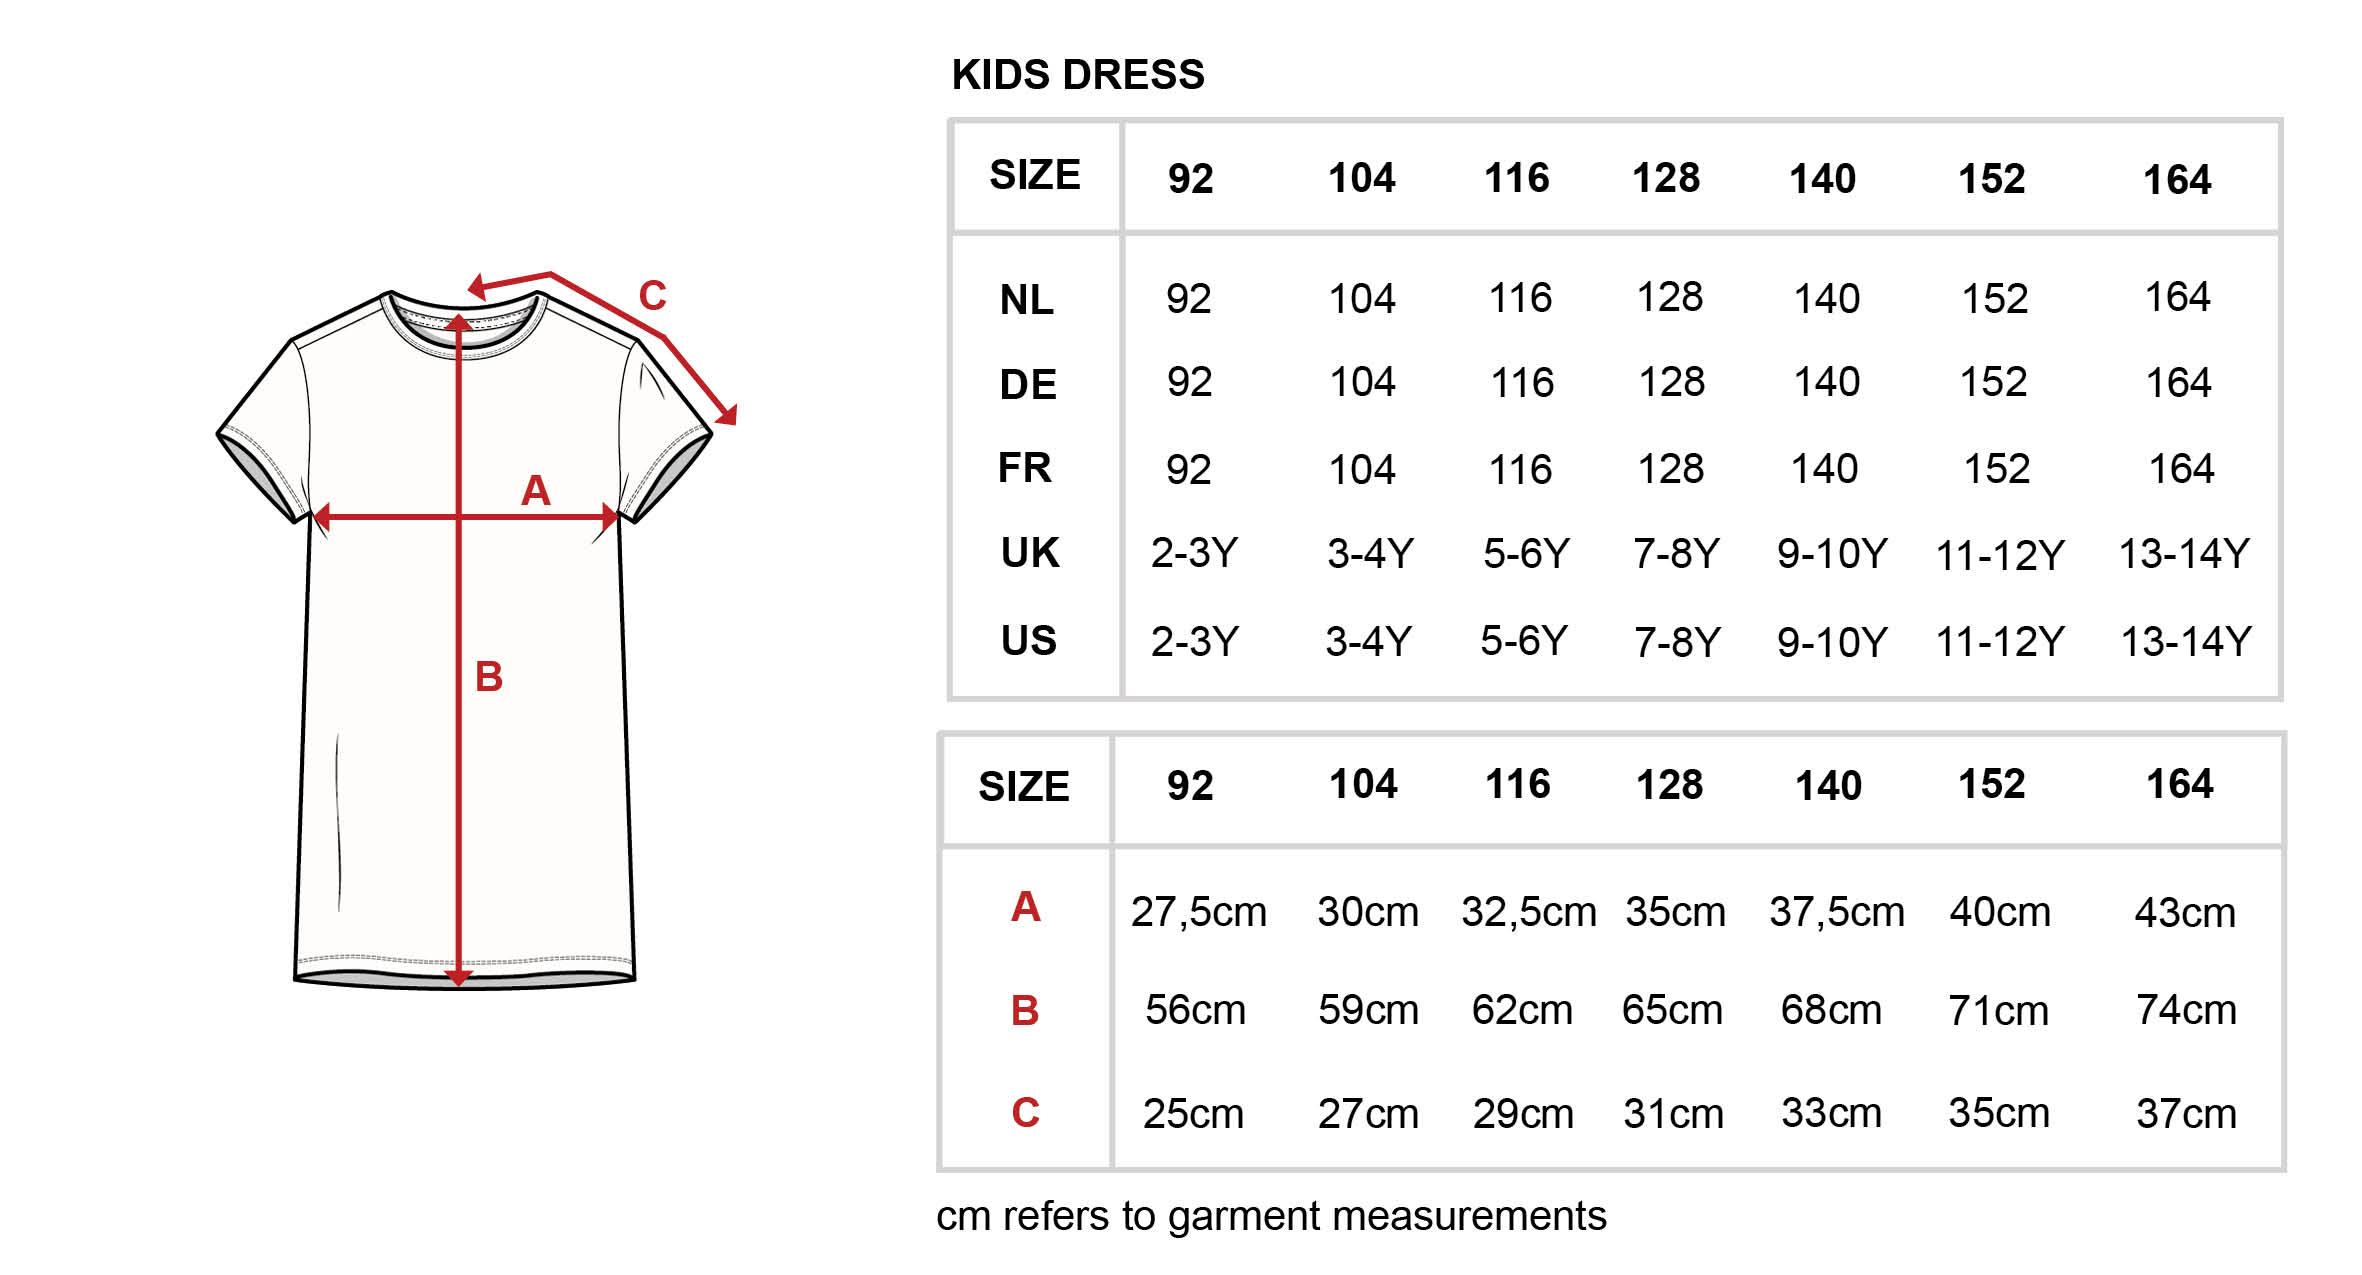 SS19-Dress-Kids